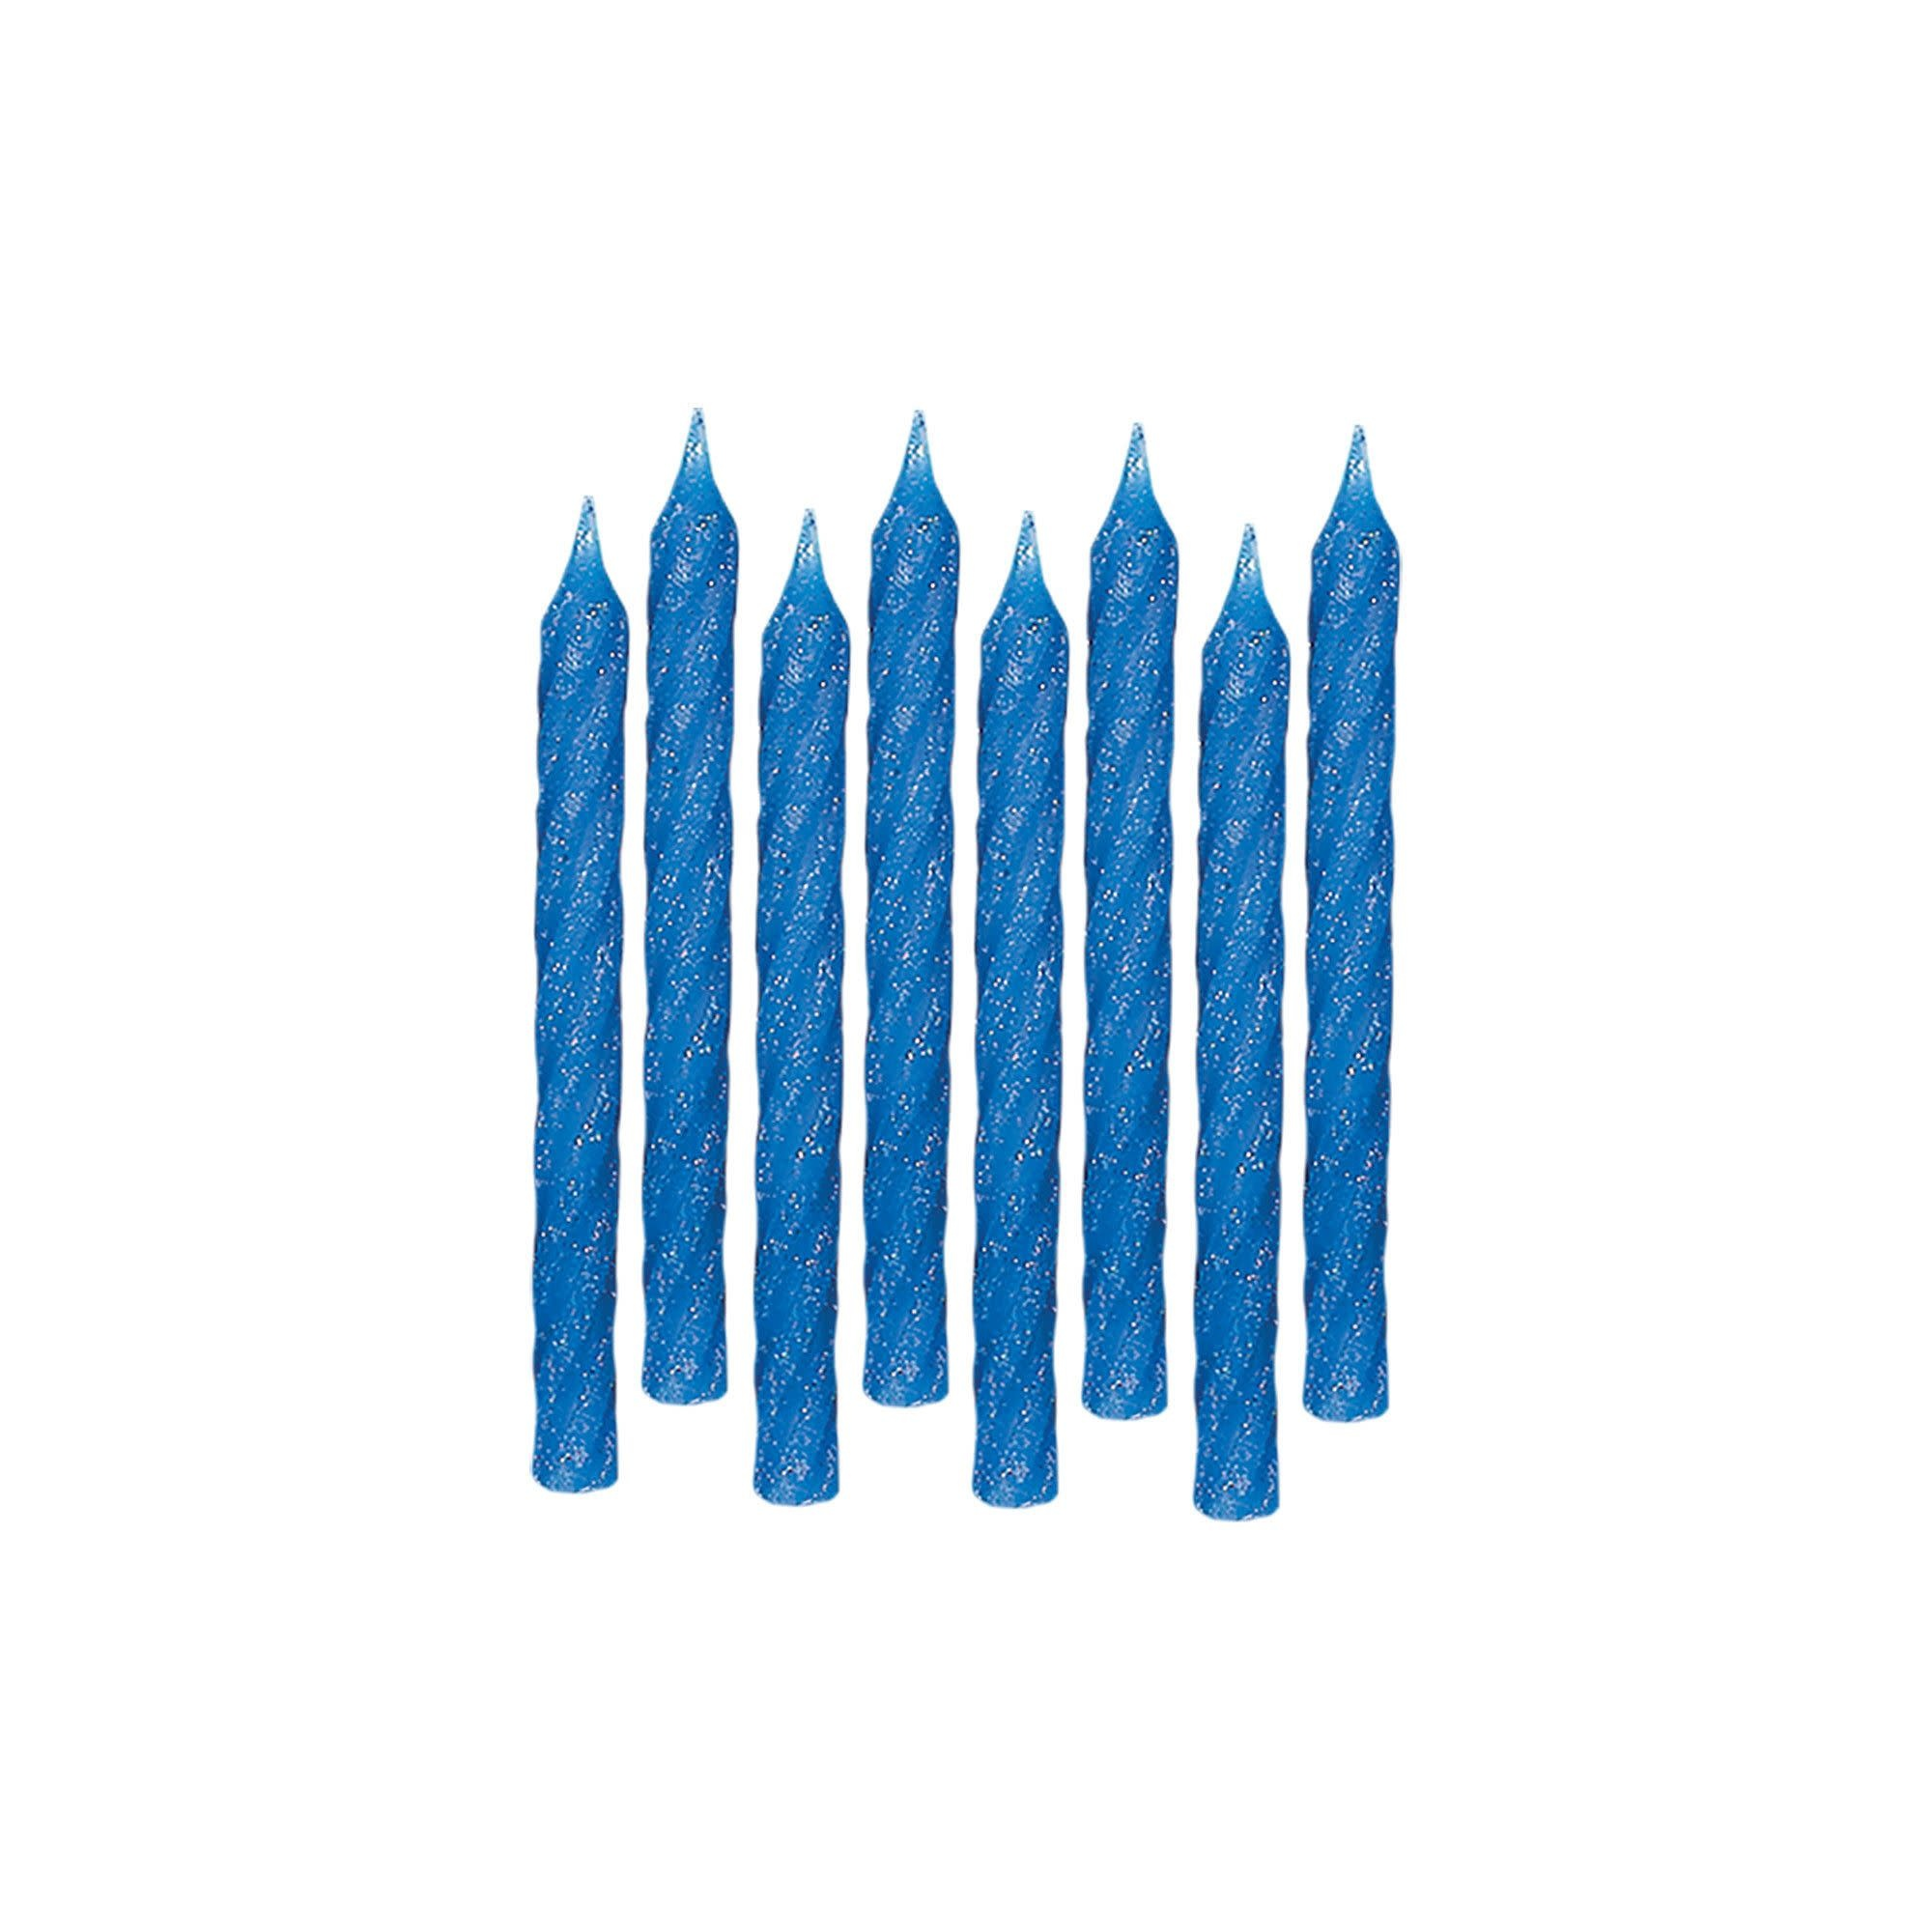 Large Glitter Spiral Candles - Blue